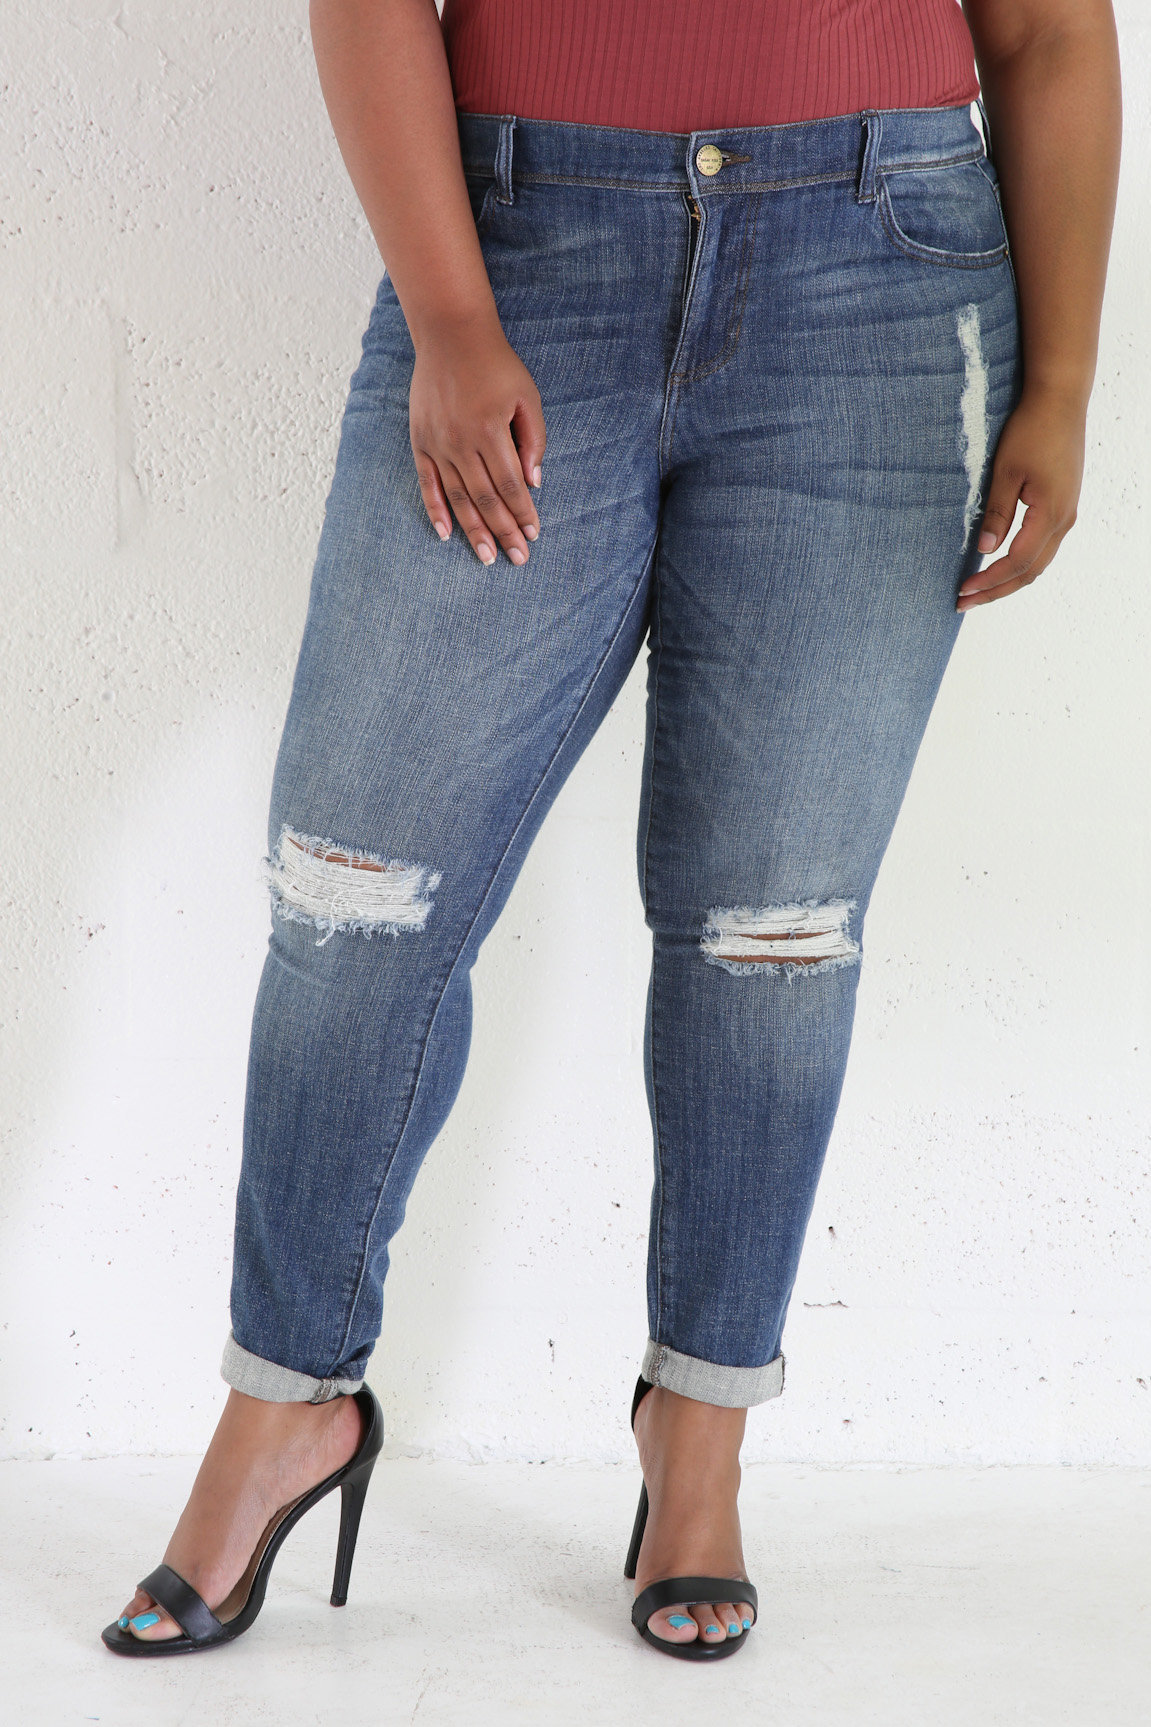 Distress Hole All Purpose Jeans